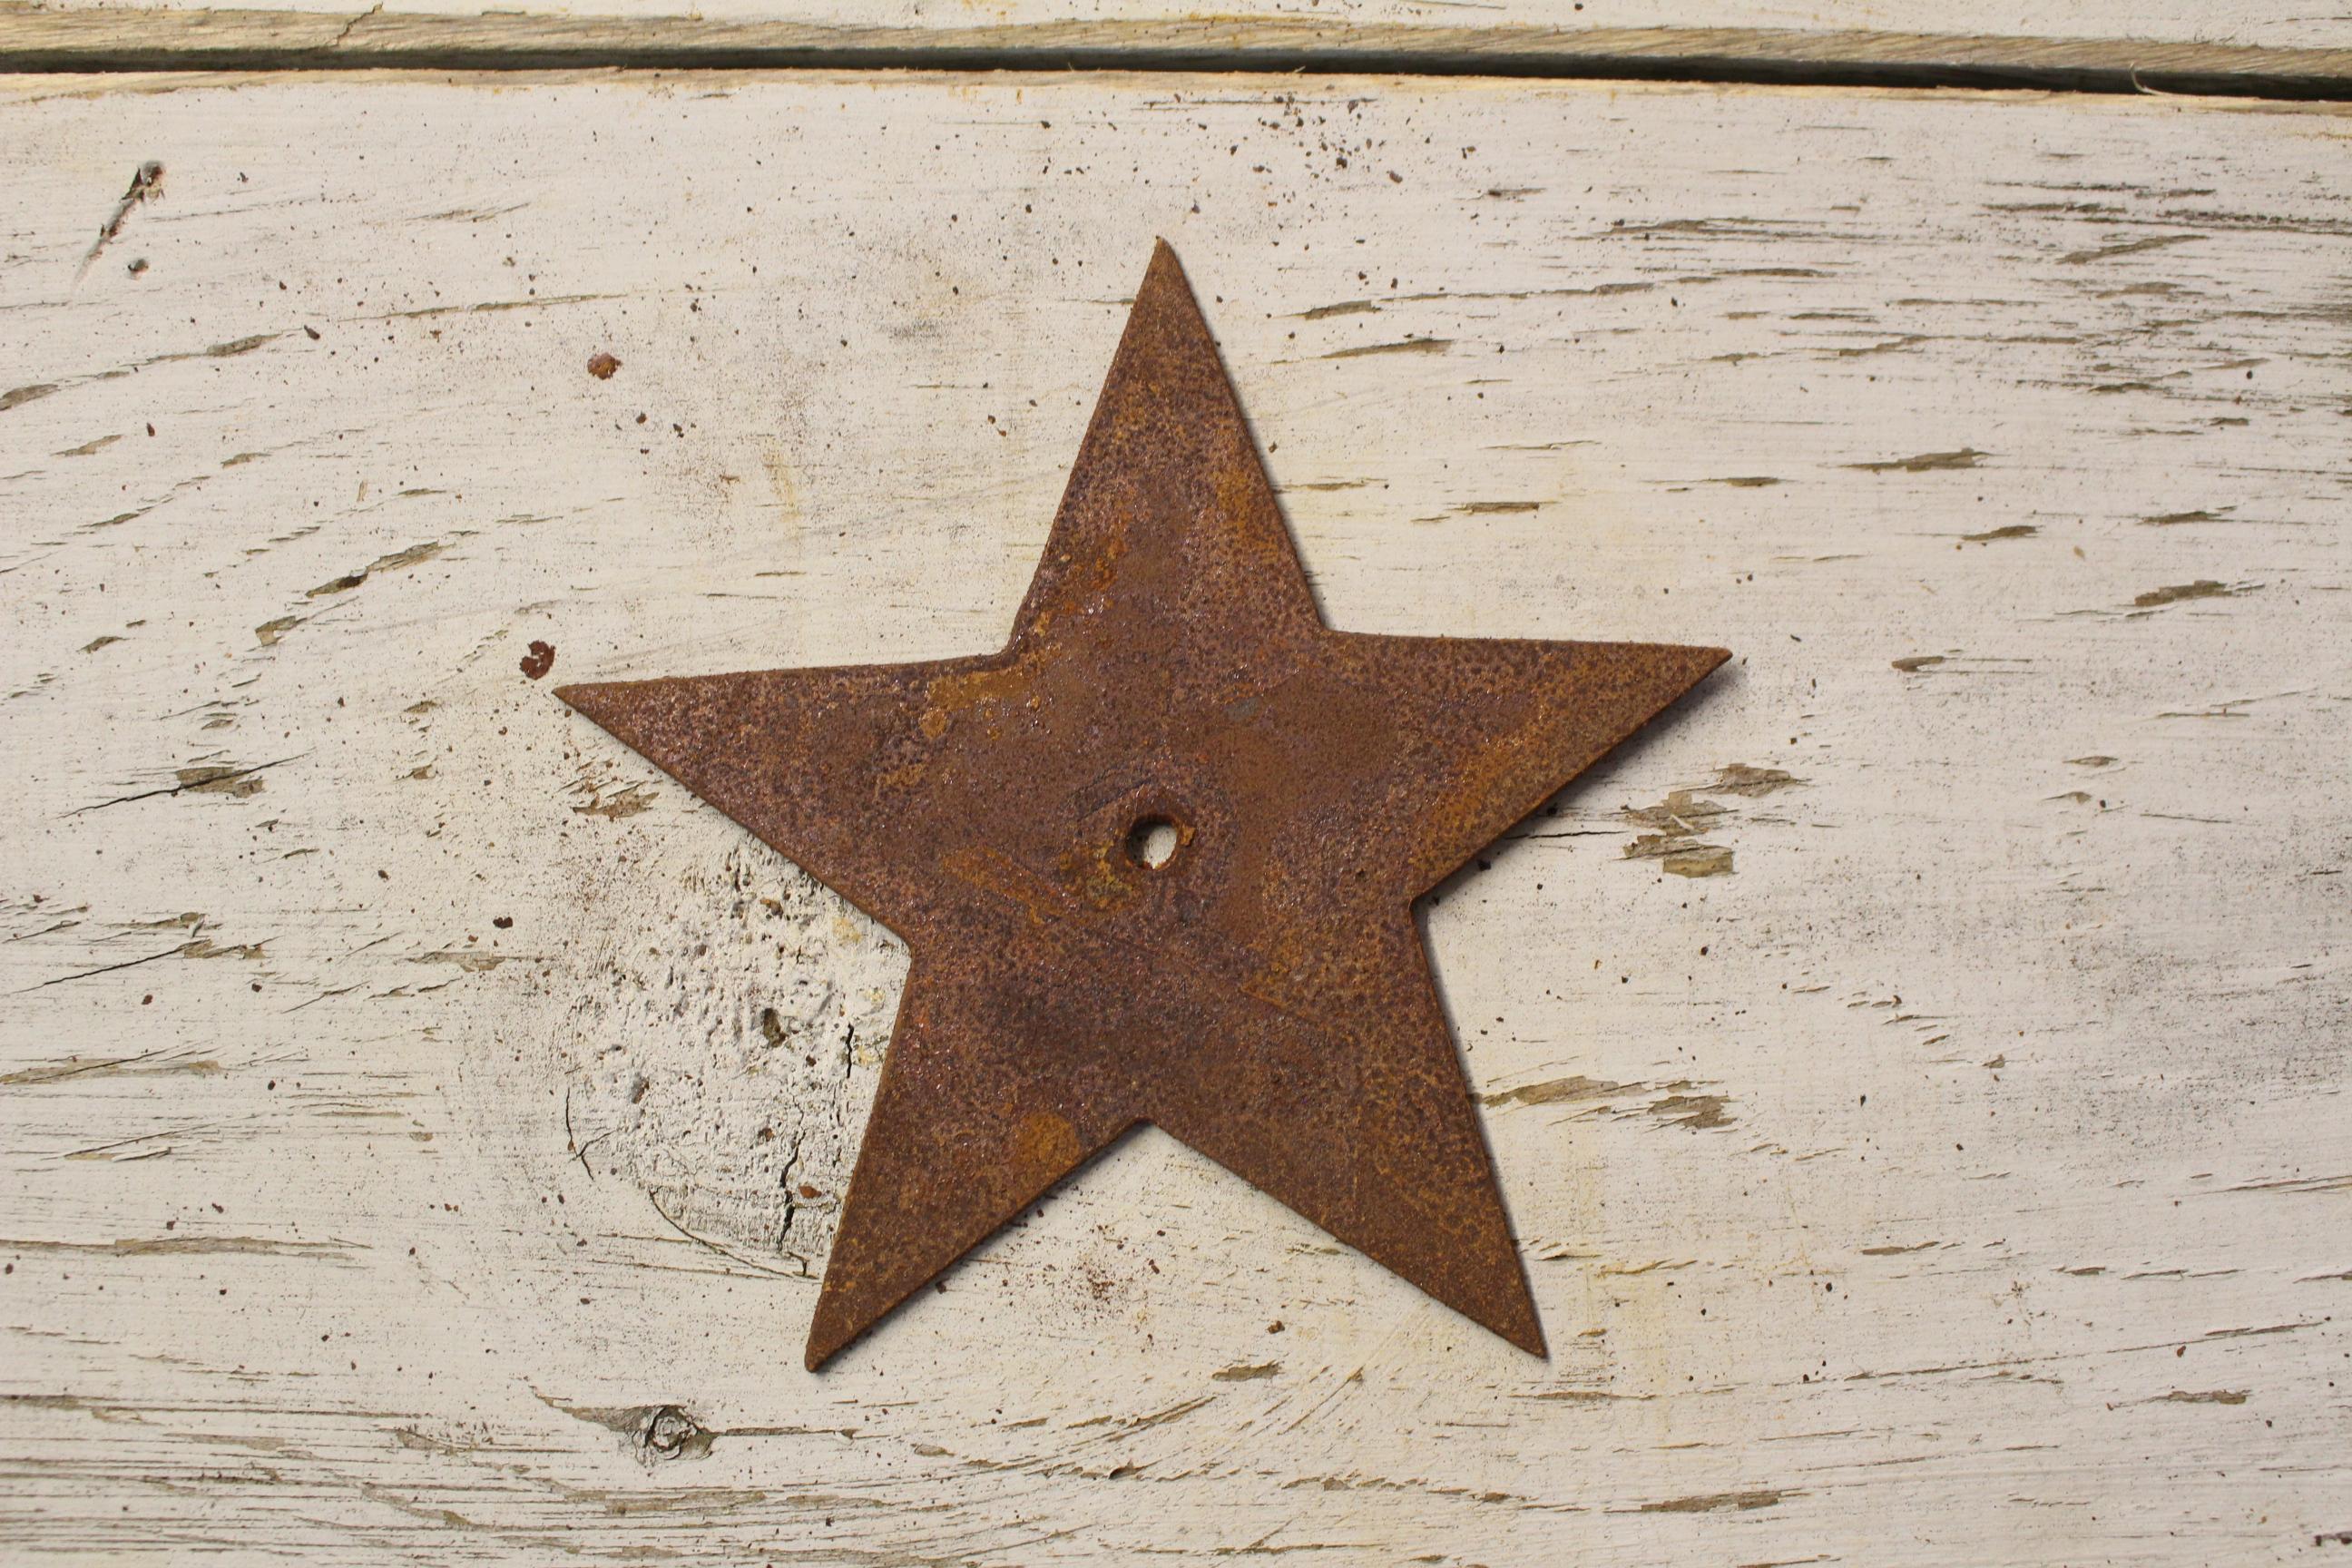 Metal Star Wall Art thick rusty metal star – rustic metal letters & wall art